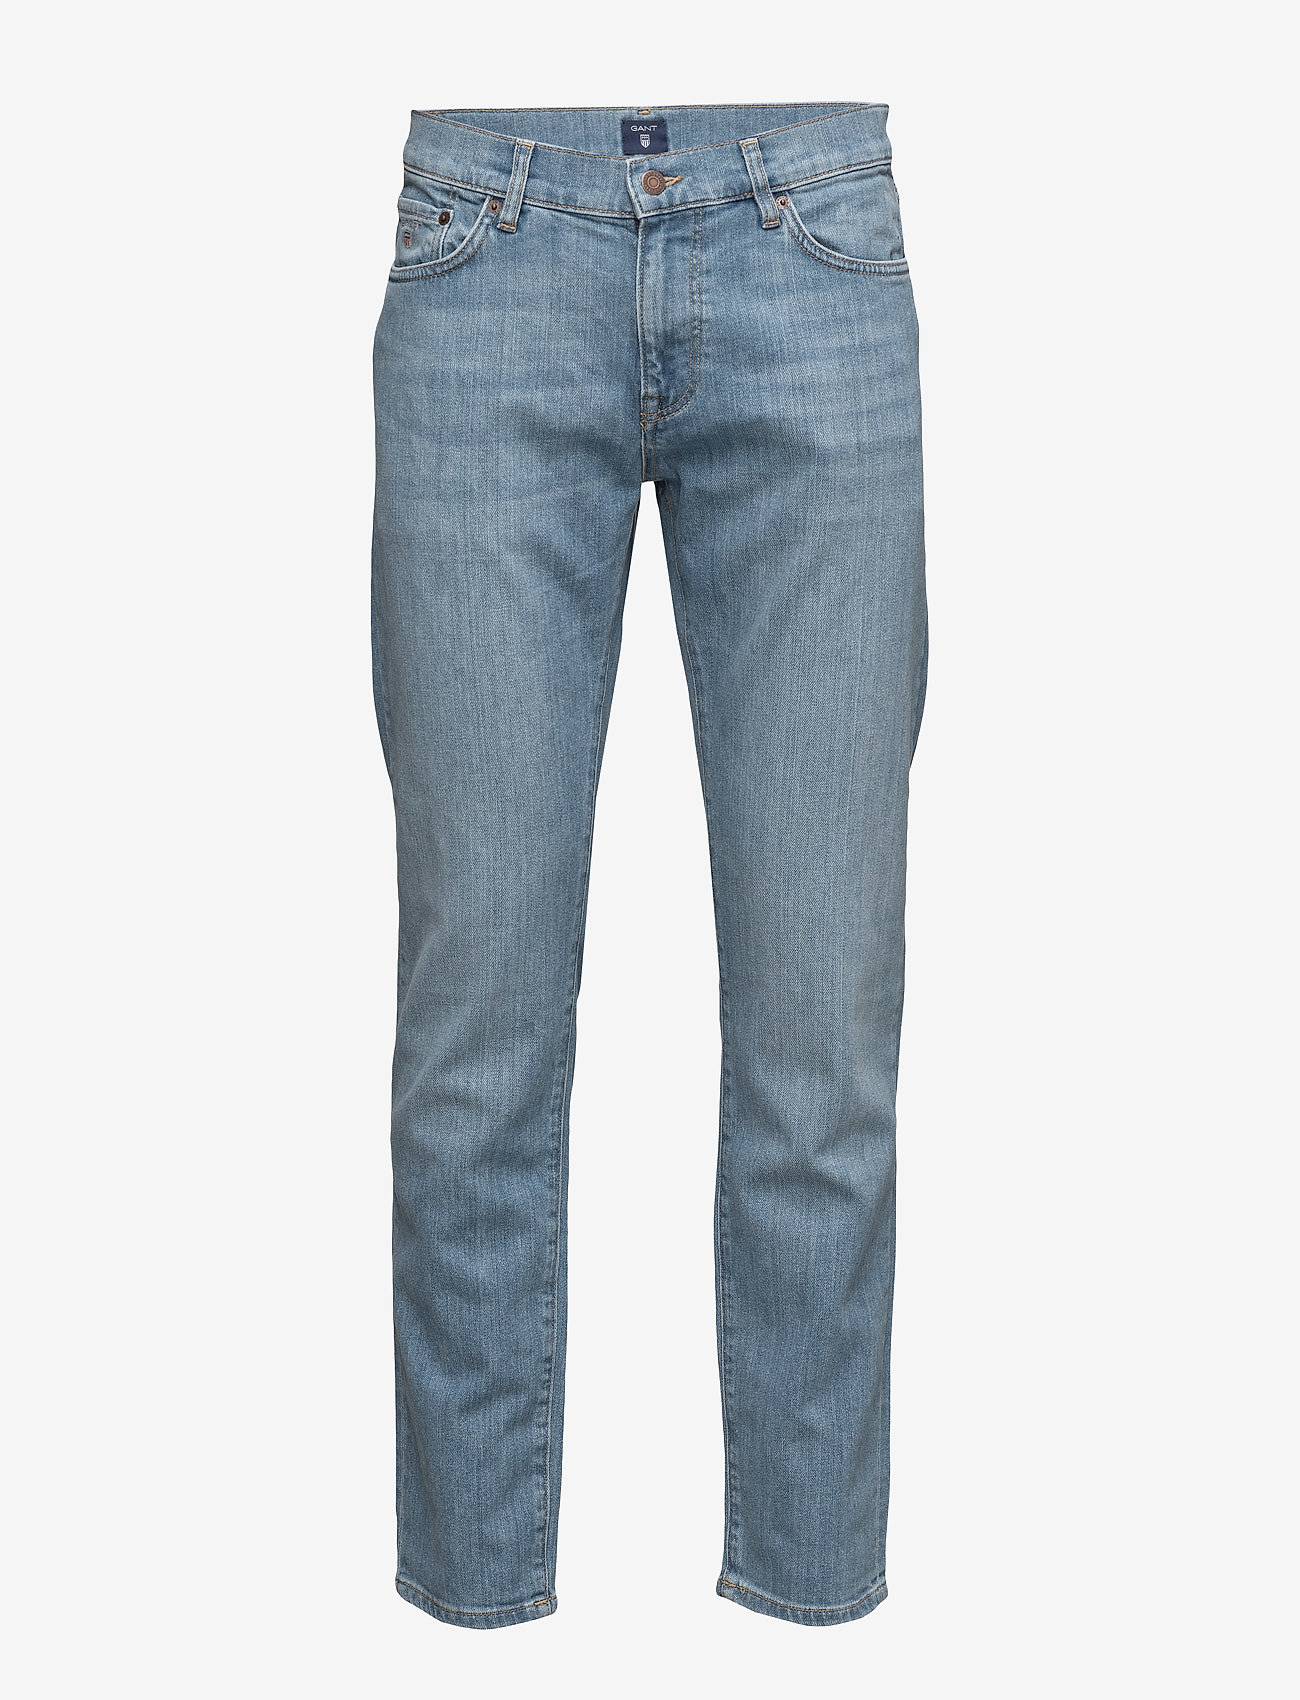 GANT - SLIM GANT JEANS - slim jeans - semi light indigo worn in - 0